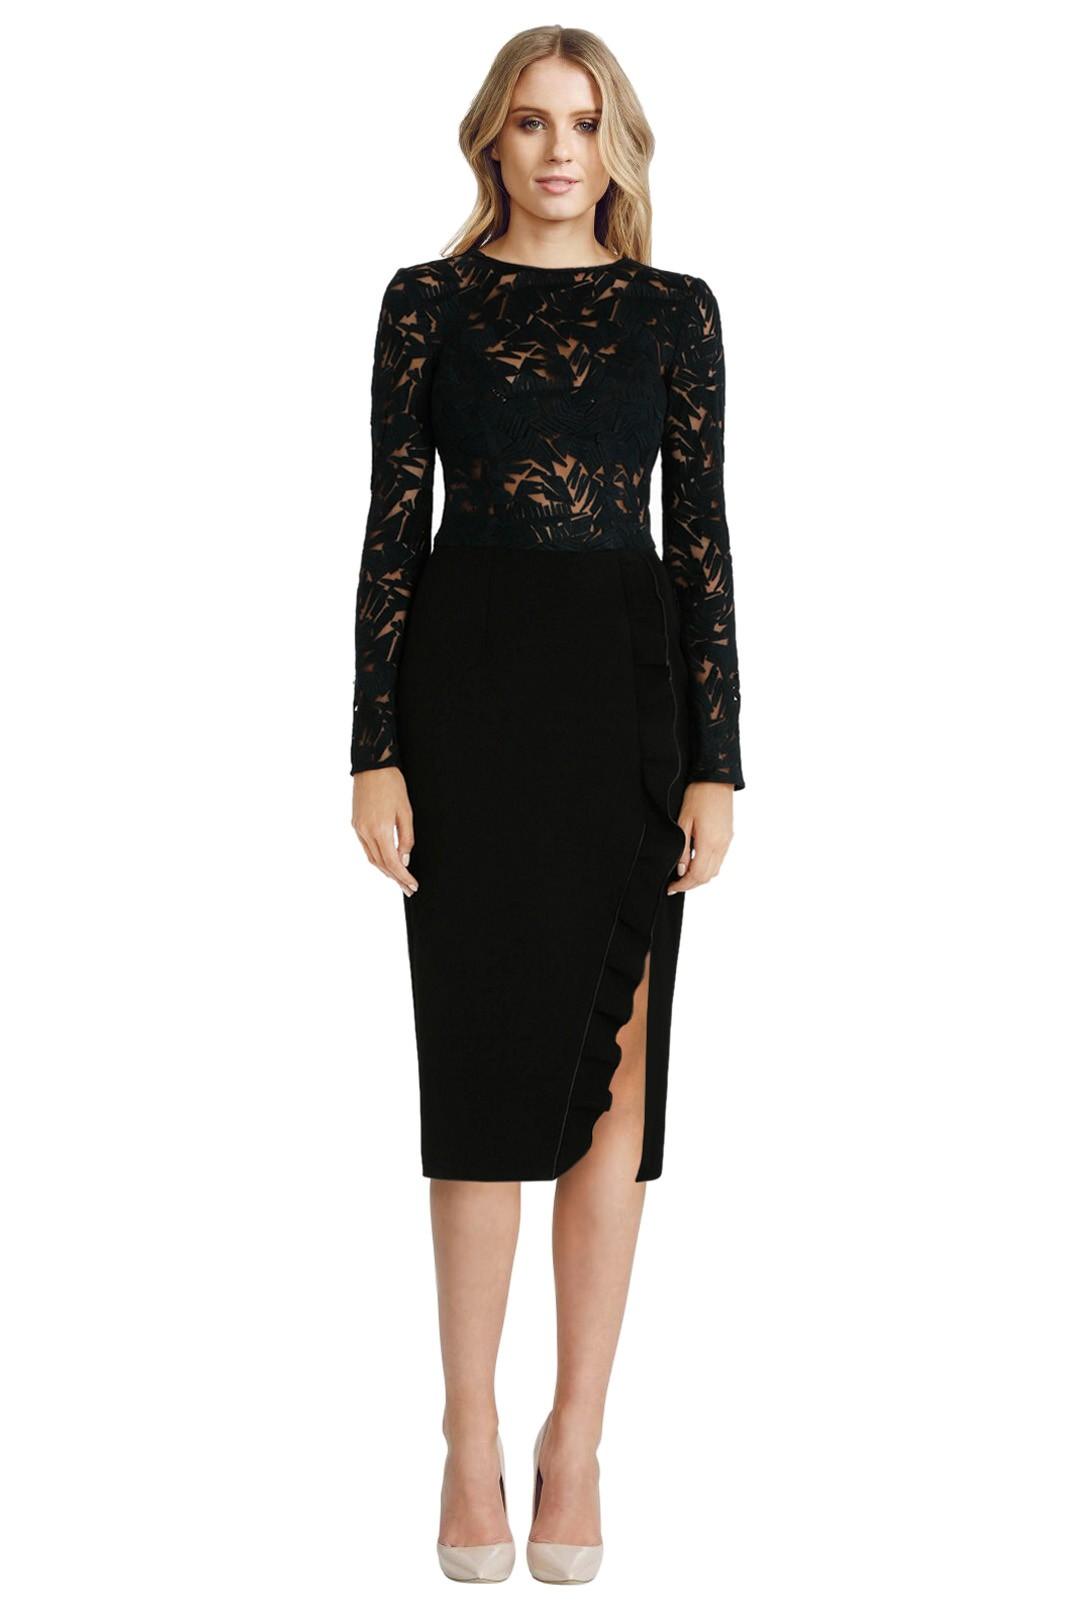 Yeojin Bae Dress Hire Melbourne